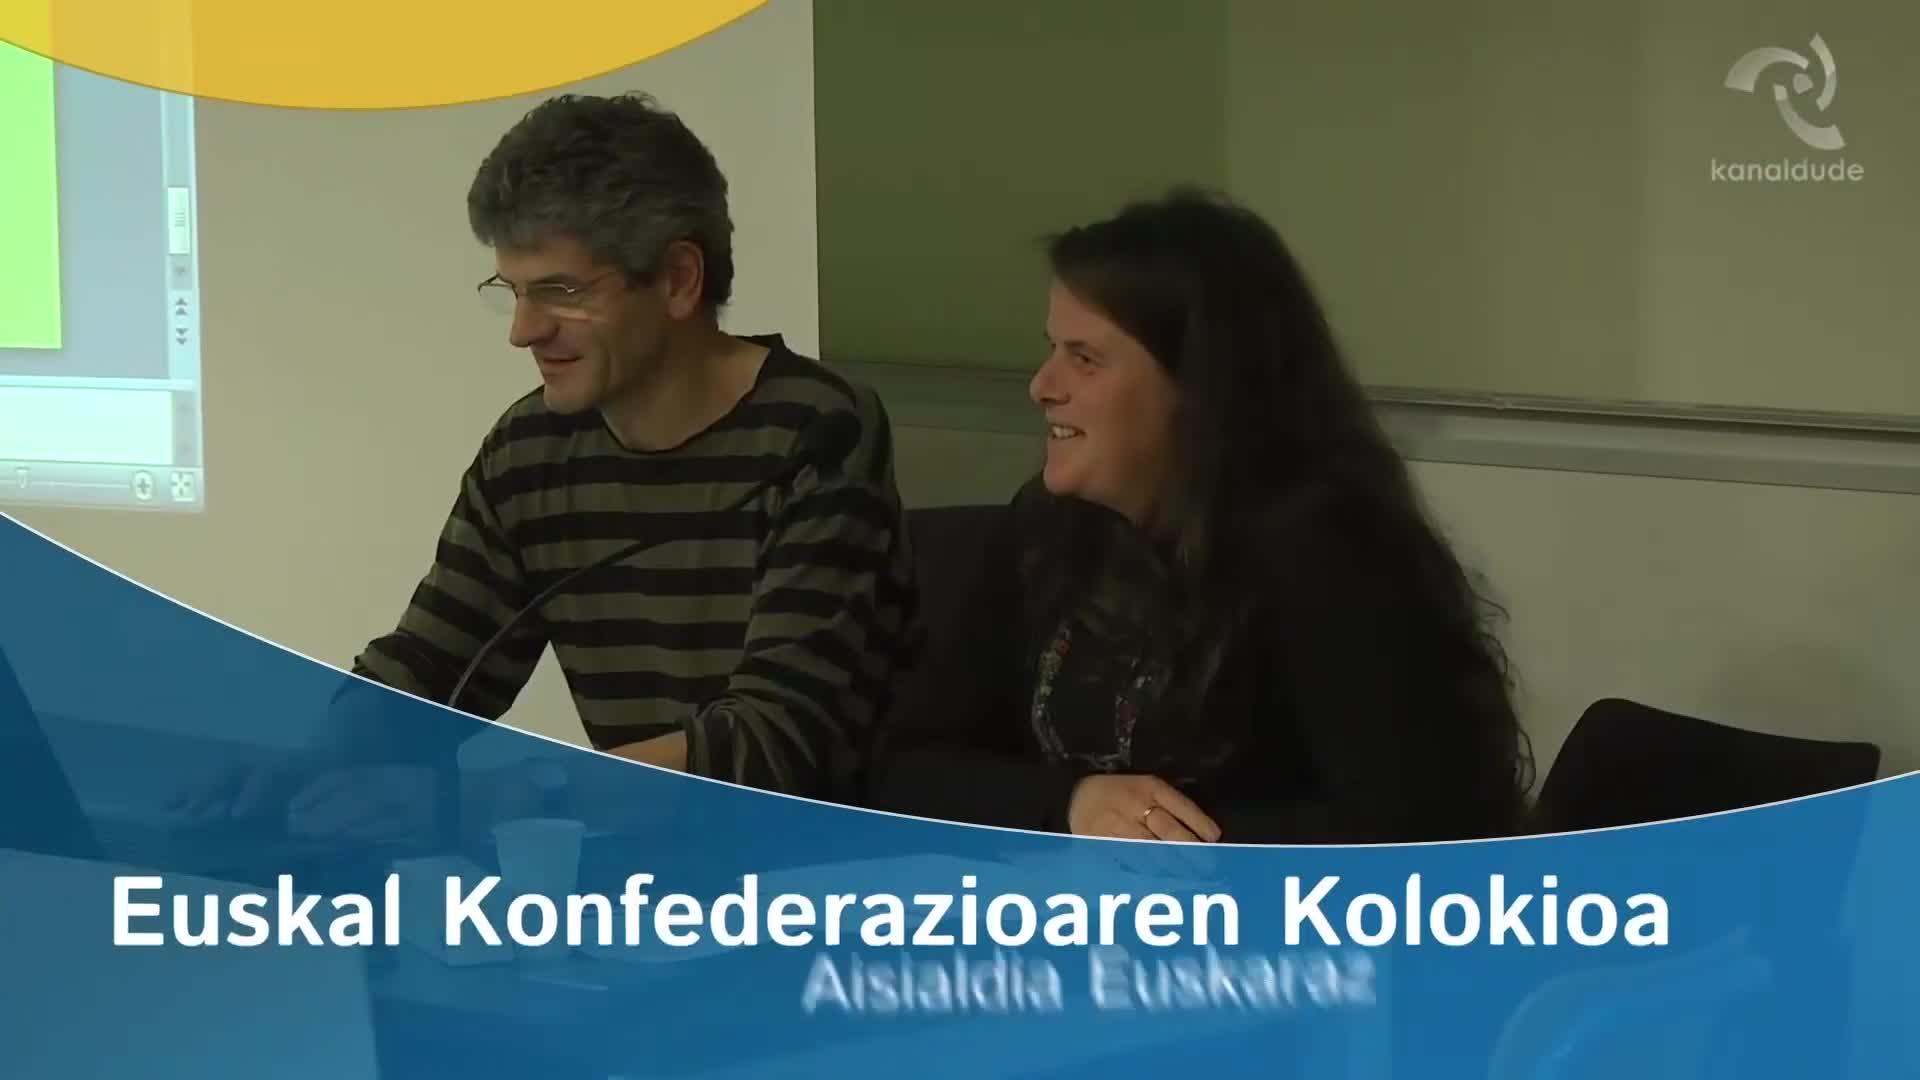 """Euskara 2020"" kolokioa: Aisialdia Euskaraz"